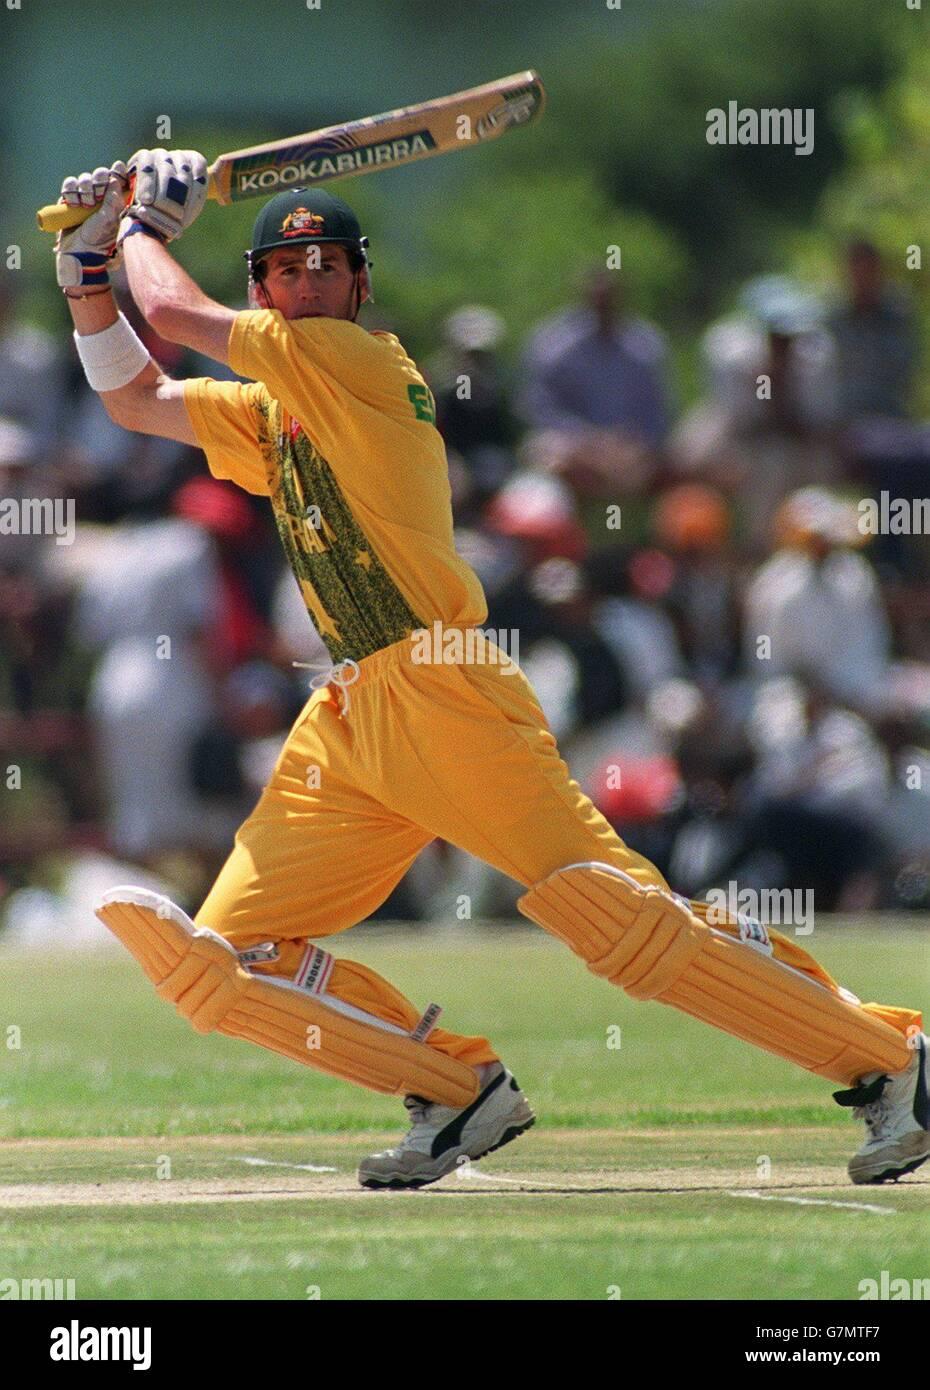 Cricket tour match transvaal invitation xi v australia stock cricket tour match transvaal invitation xi v australia stopboris Image collections